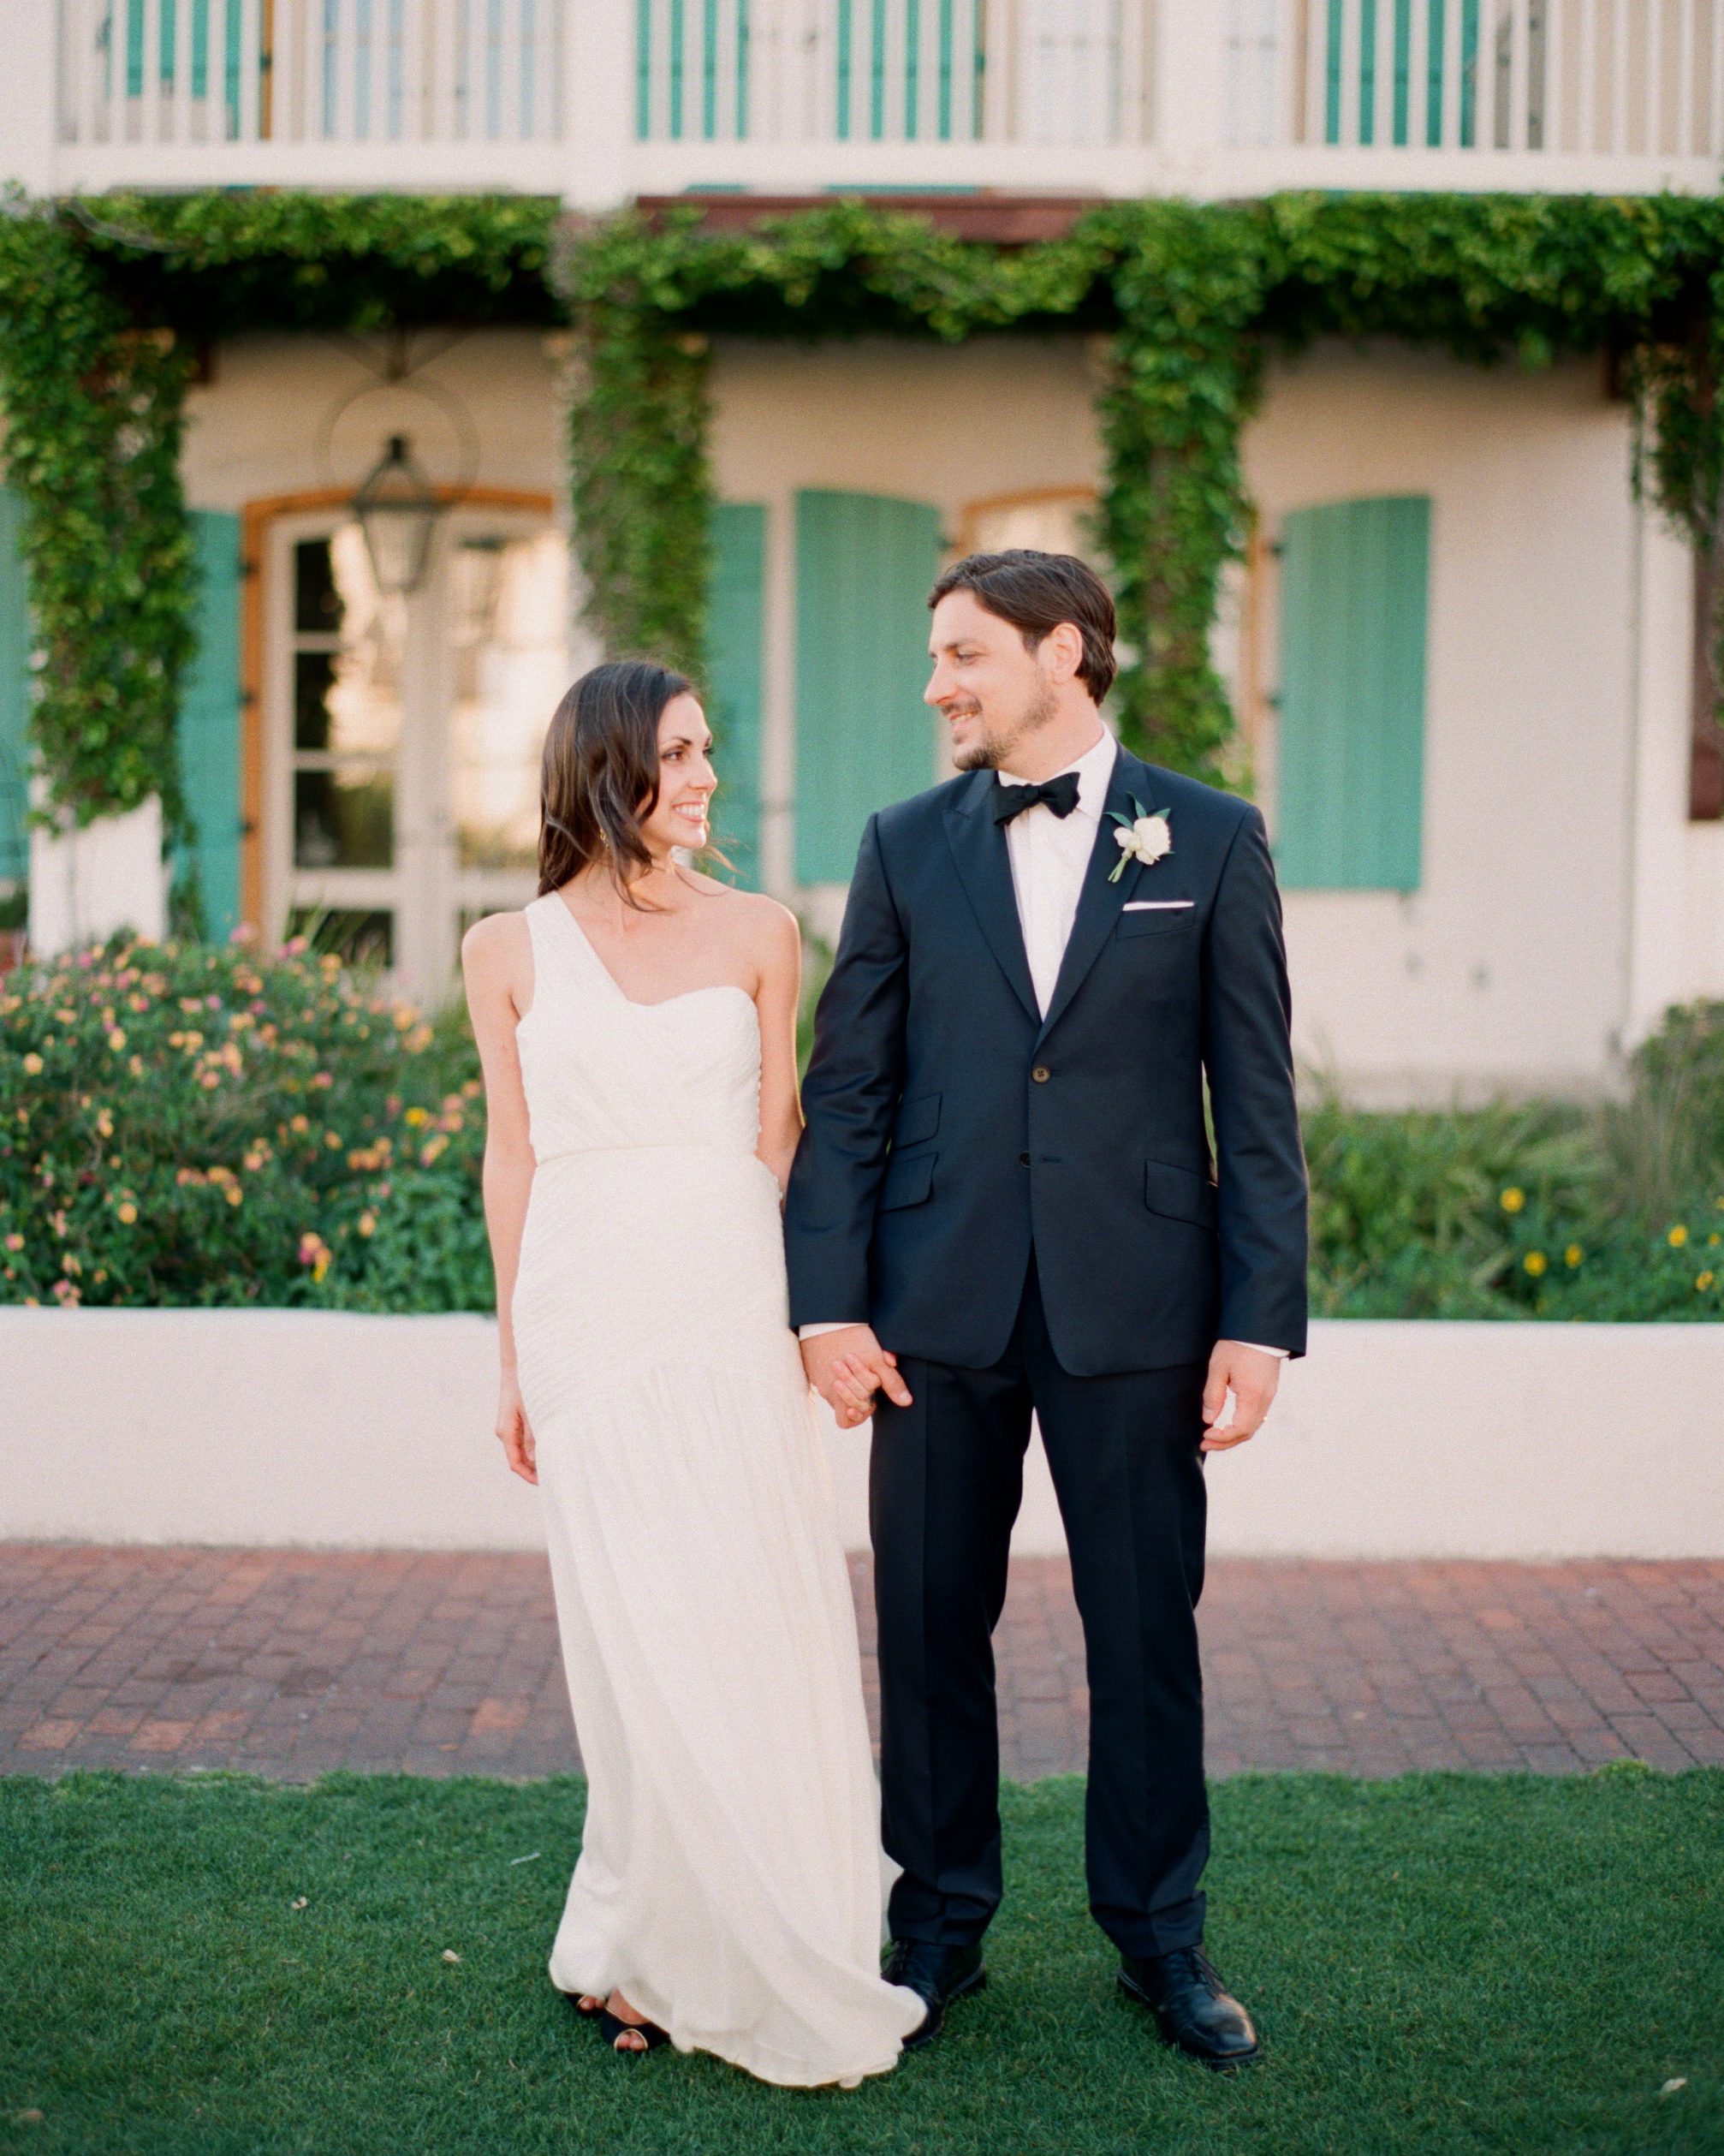 jennifer-adrien-wedding-portrait2-0614.jpg